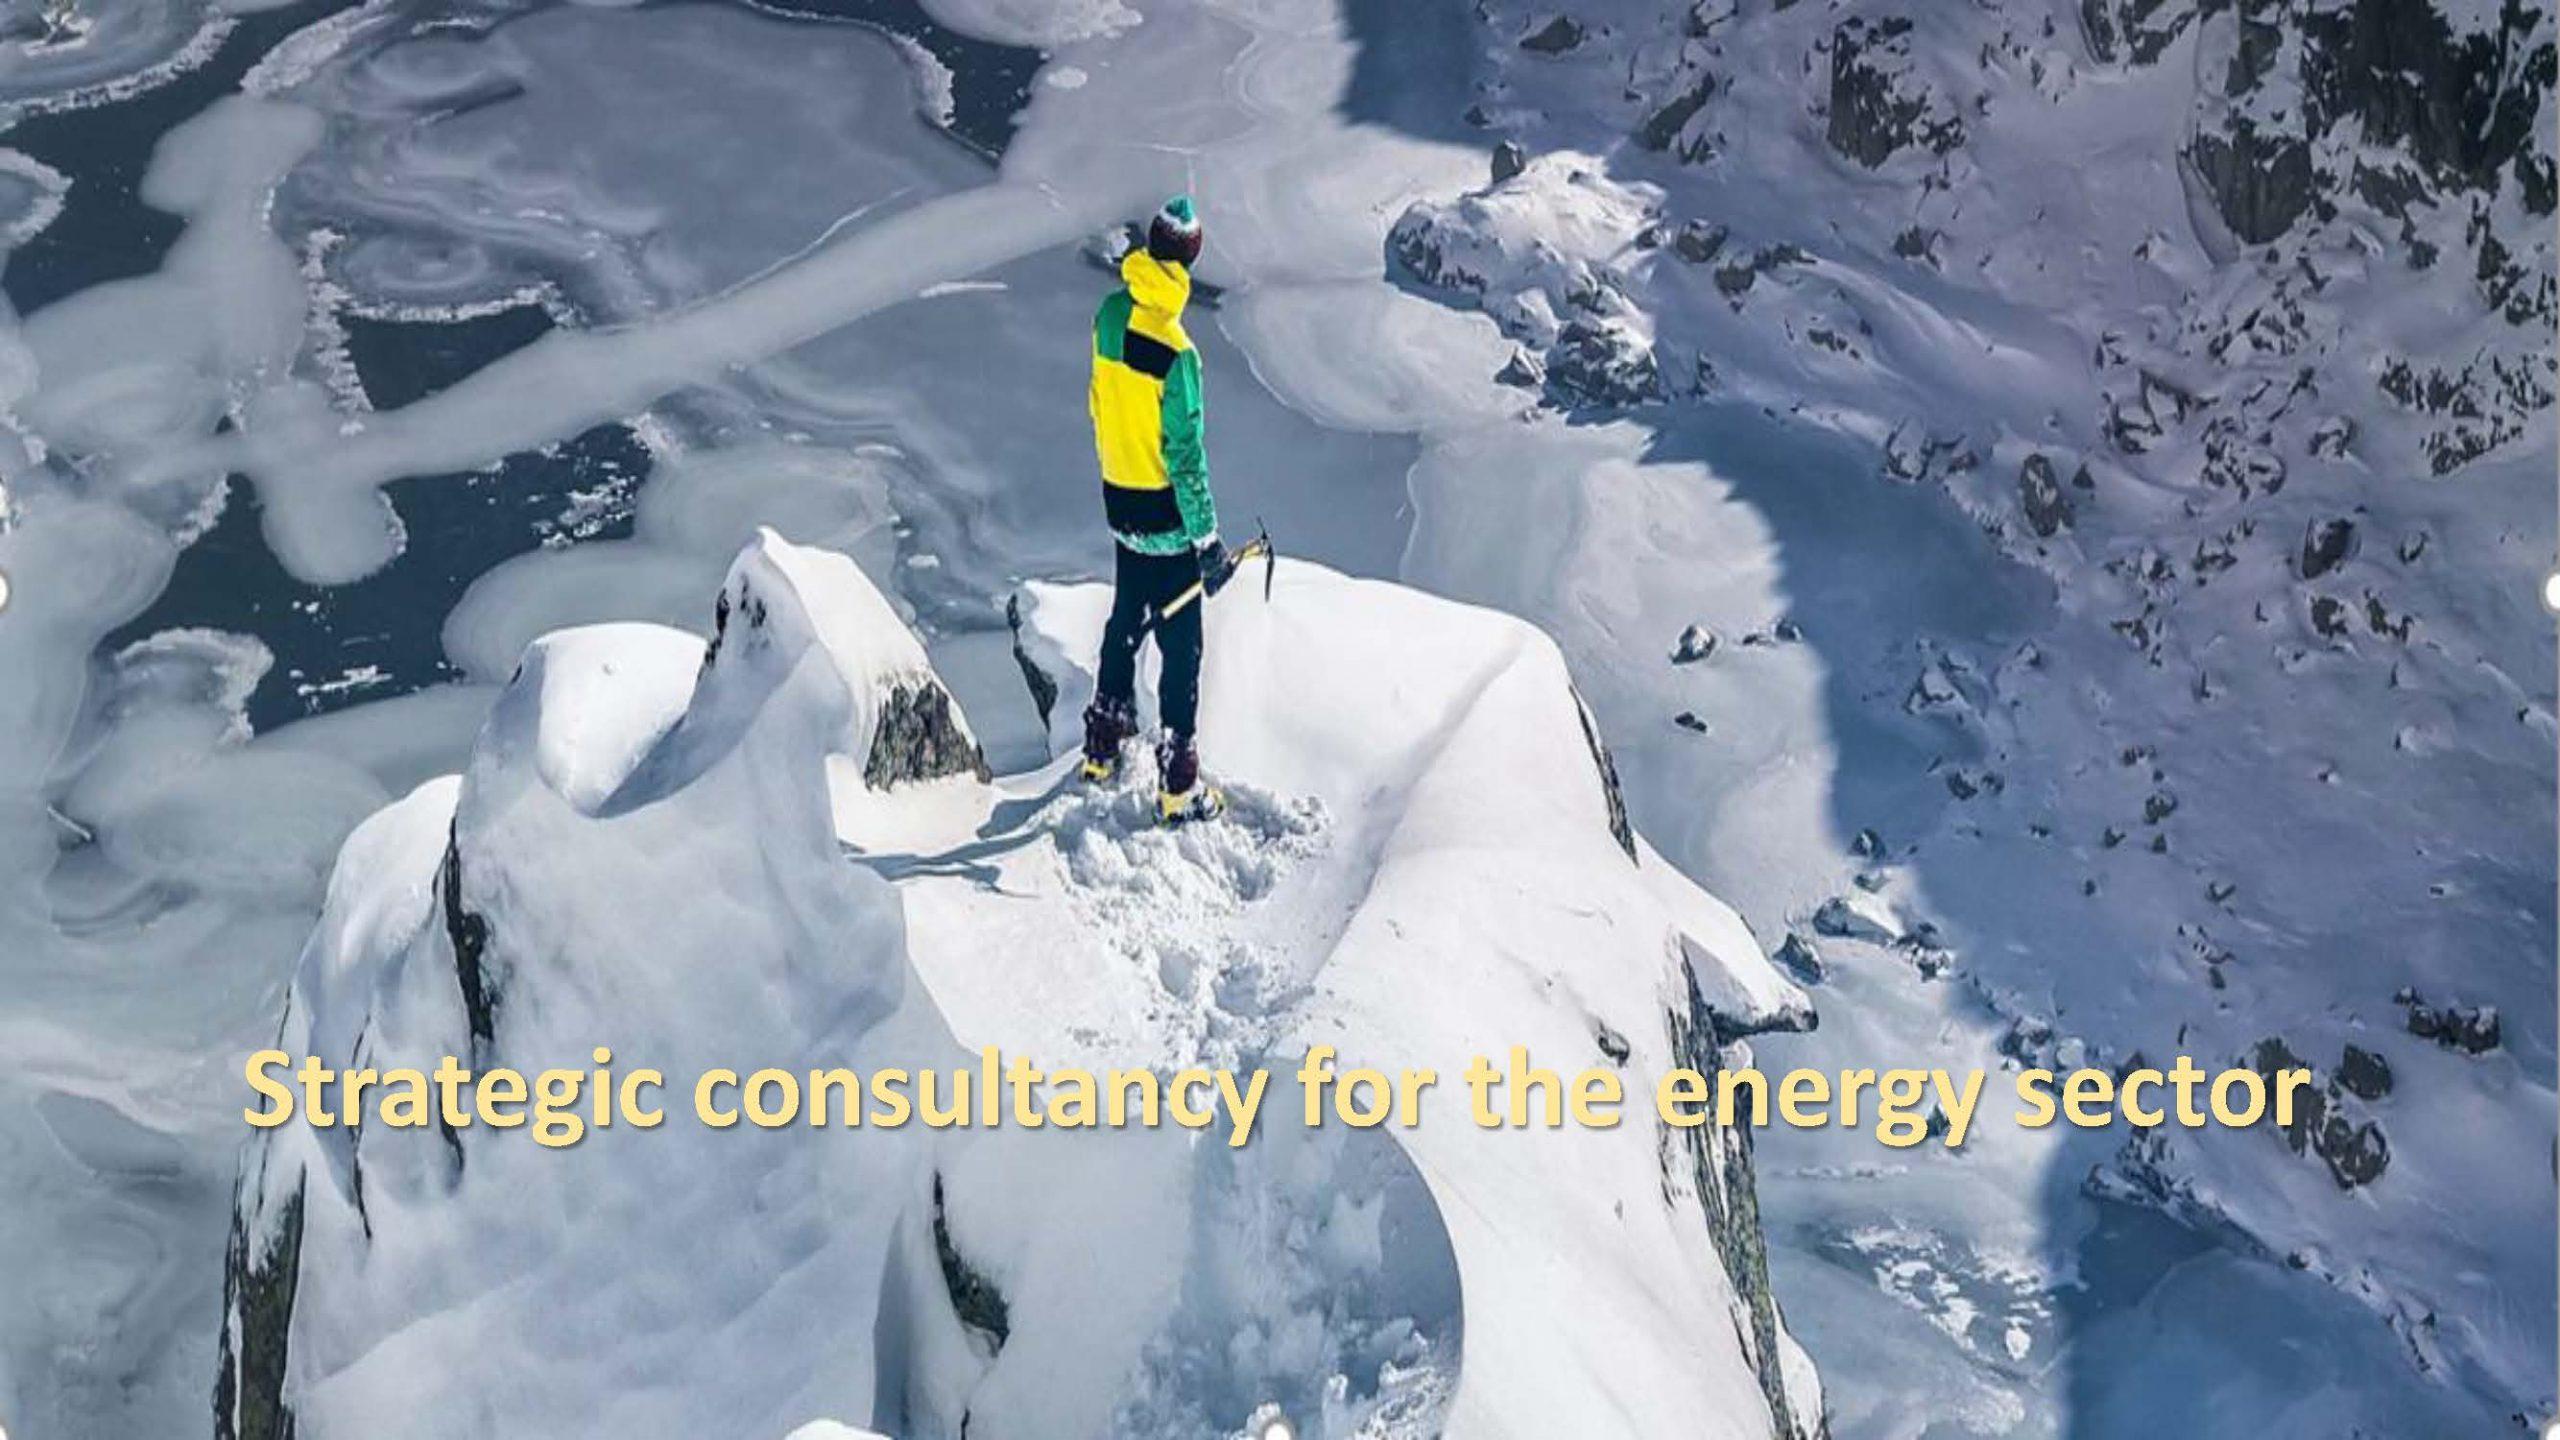 ValVestris Strategic Consultancy for the Energy Sector